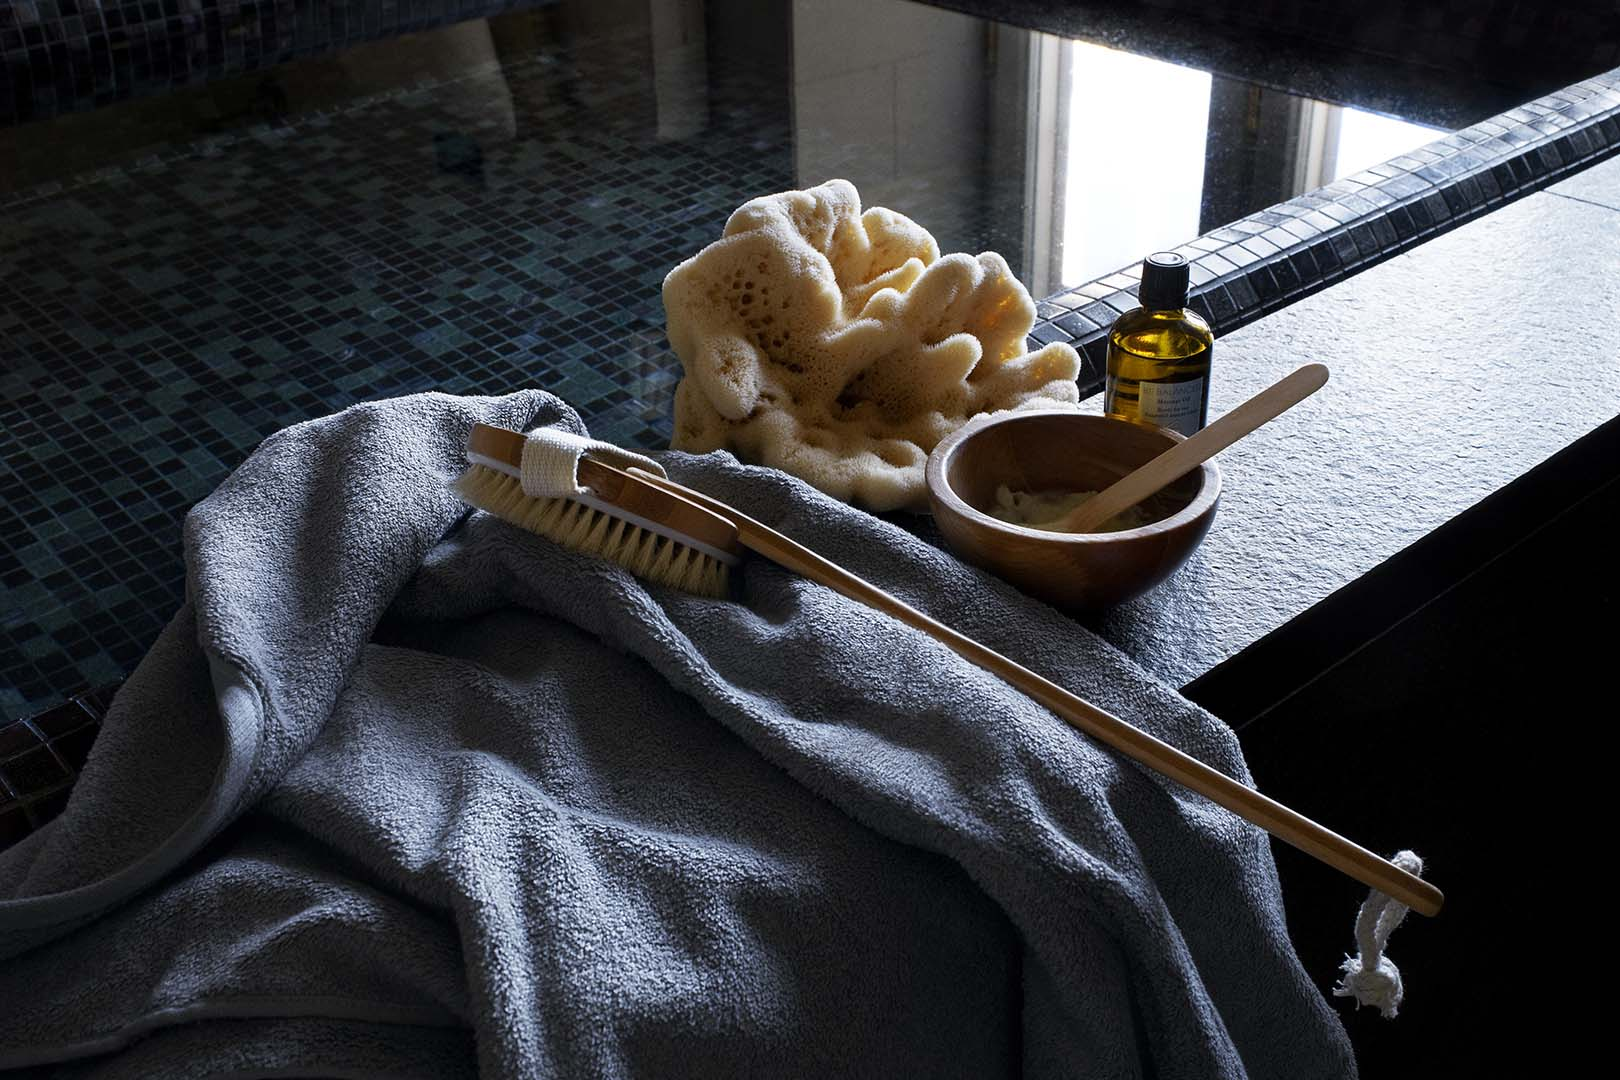 Grand Hôtel: Find the Nordic calm, Scan Magazine